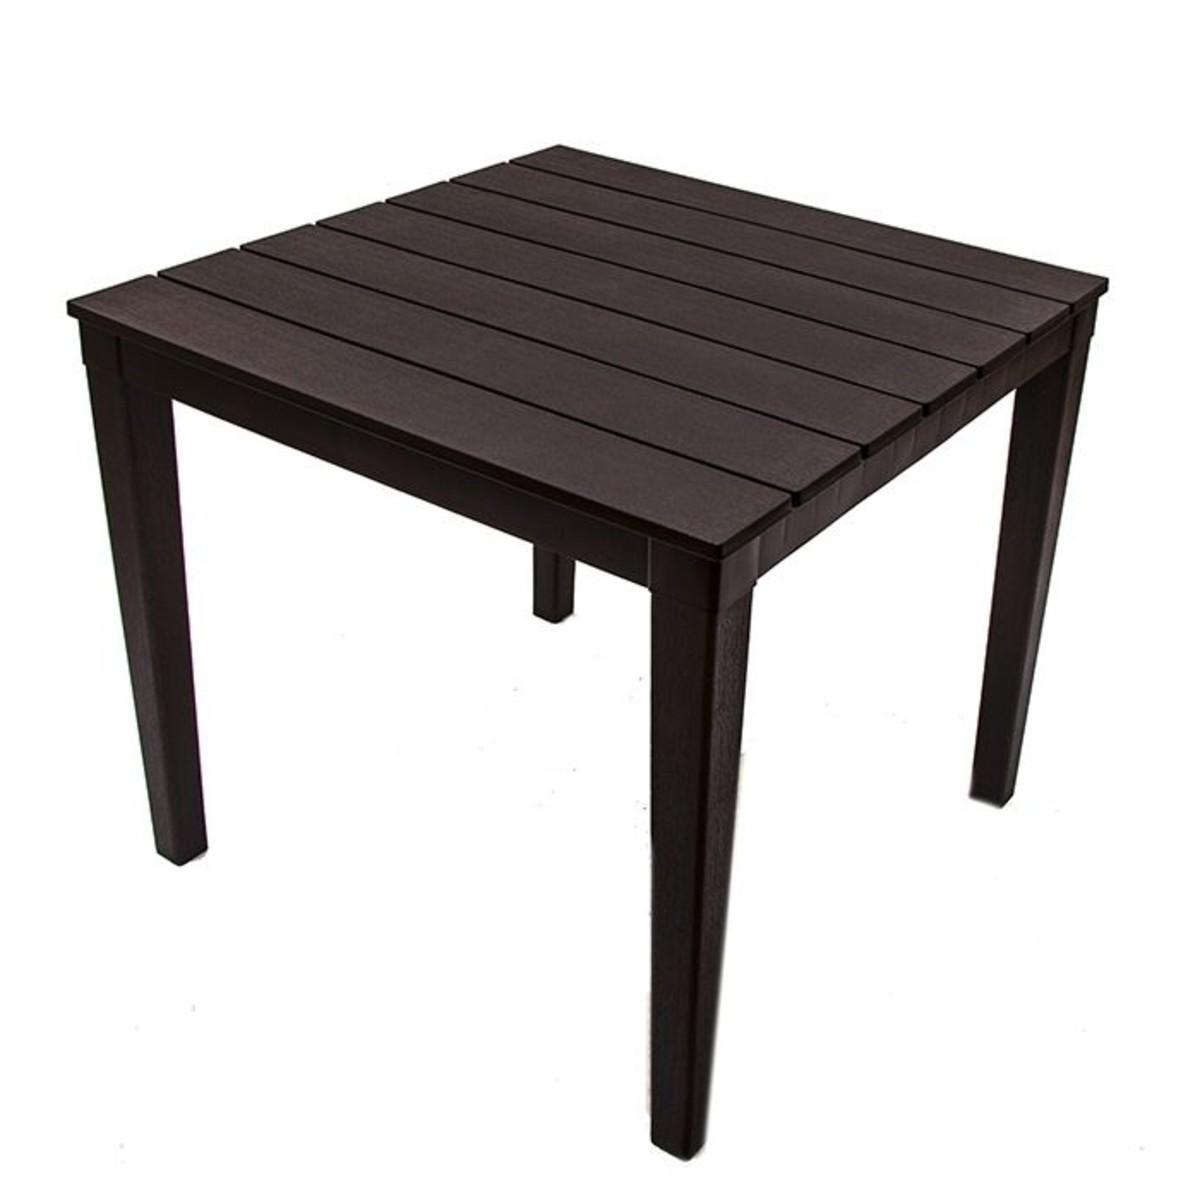 Стол садовый квадратный Прованс 83х83х82 см цвет шоколадный